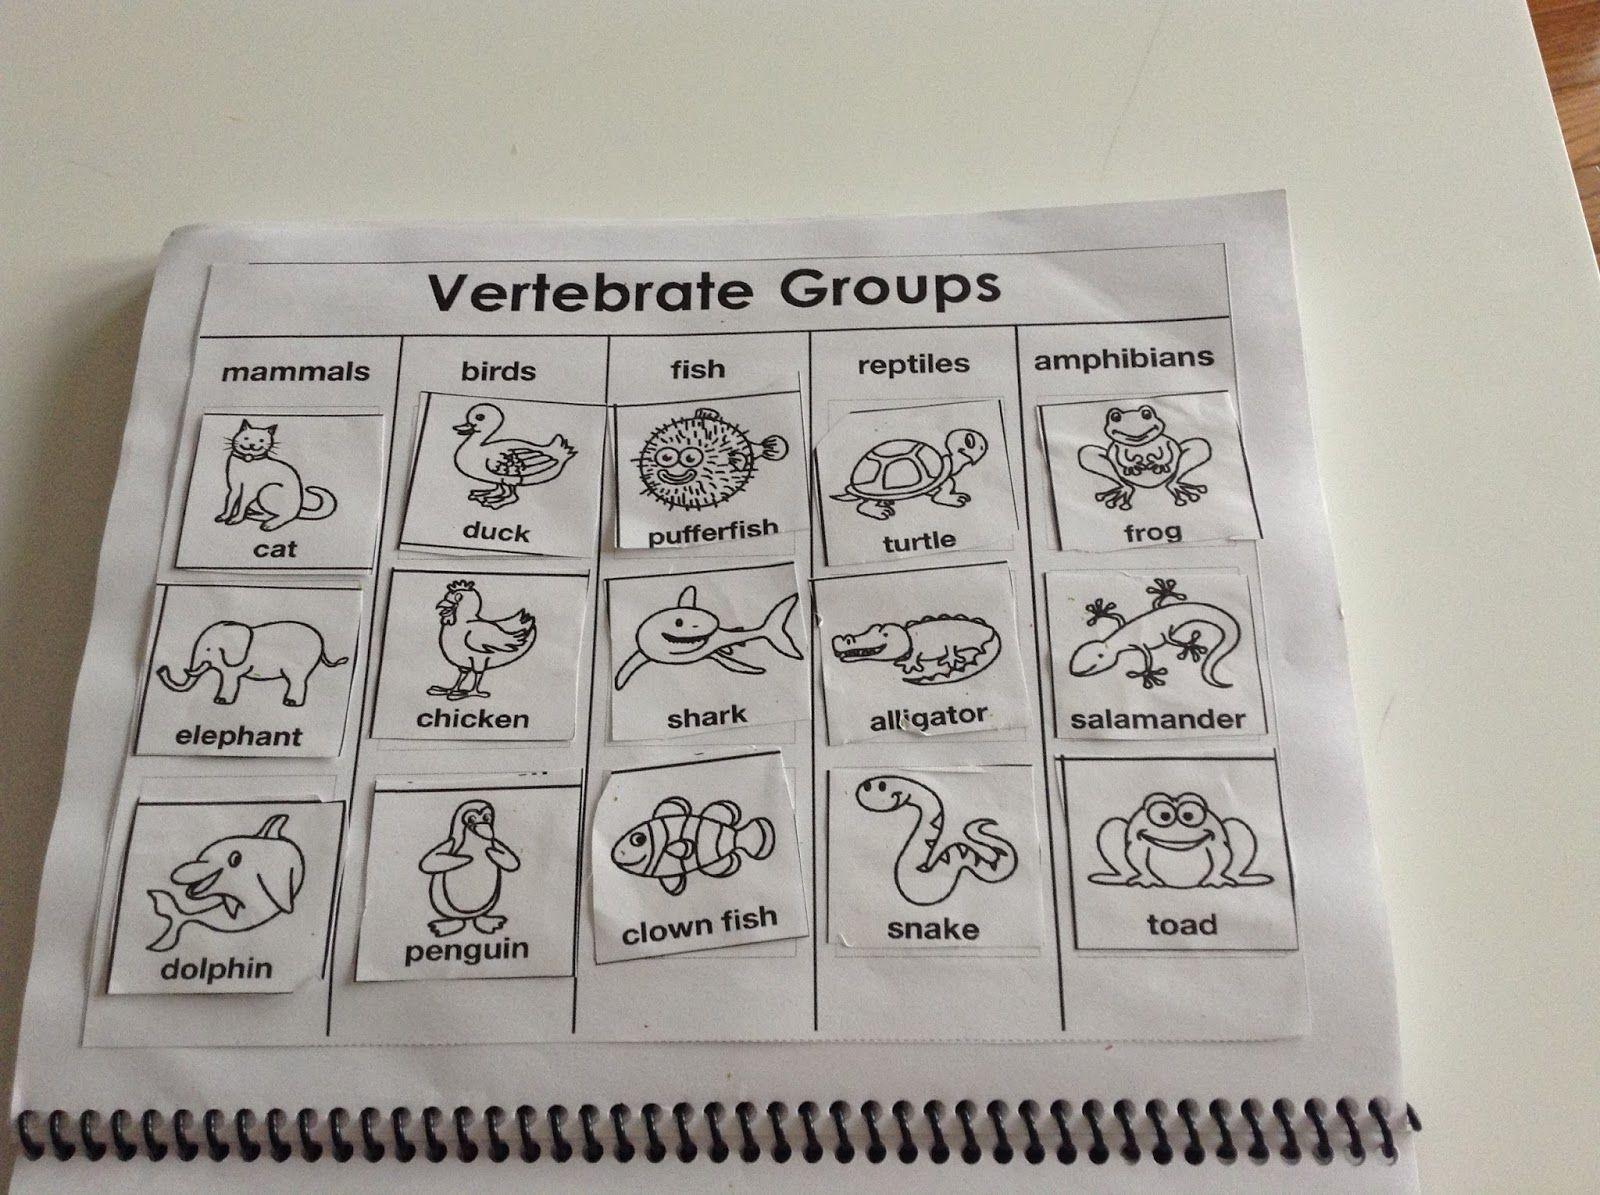 Worksheets Vertebrates And Invertebrates Worksheets pin by lorrie blackard friet on printable worksheets pinterest vertebrates and invertebrates unit study